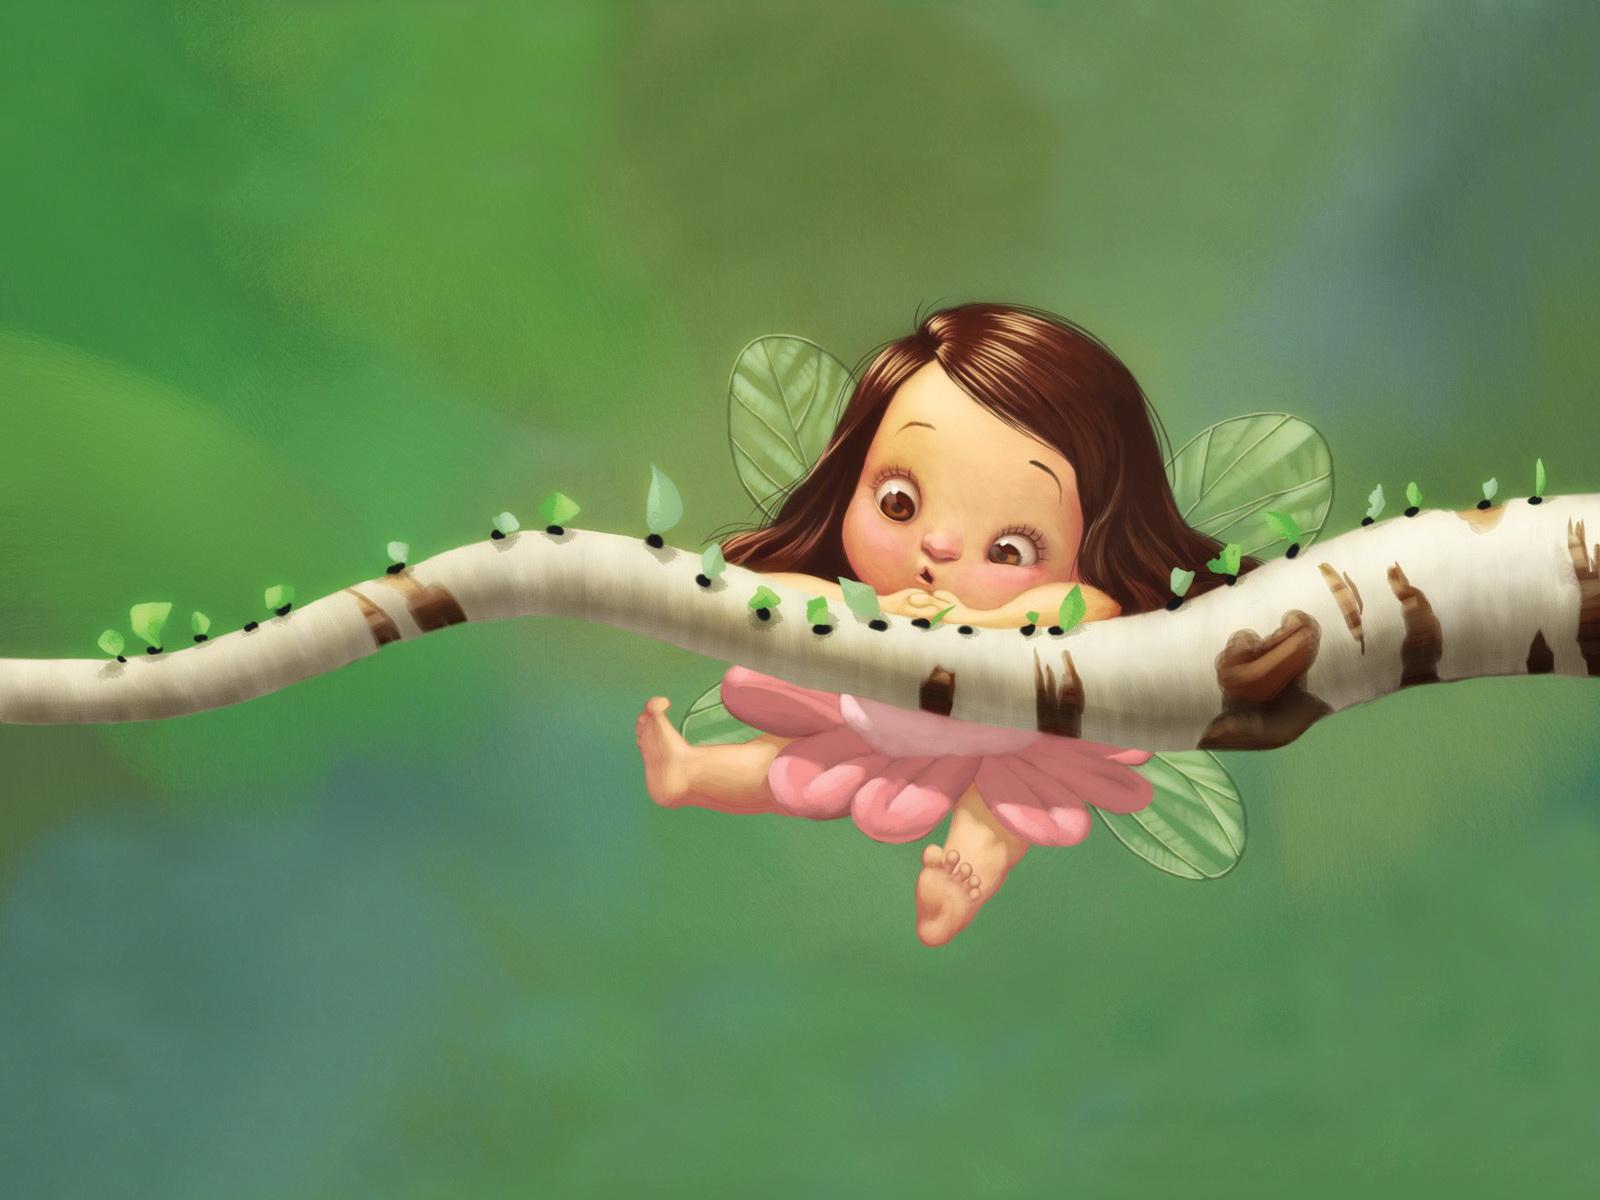 Japan 3D Fairy wallpaper Cute Fairy Wallpapers Desktop 1600x1200